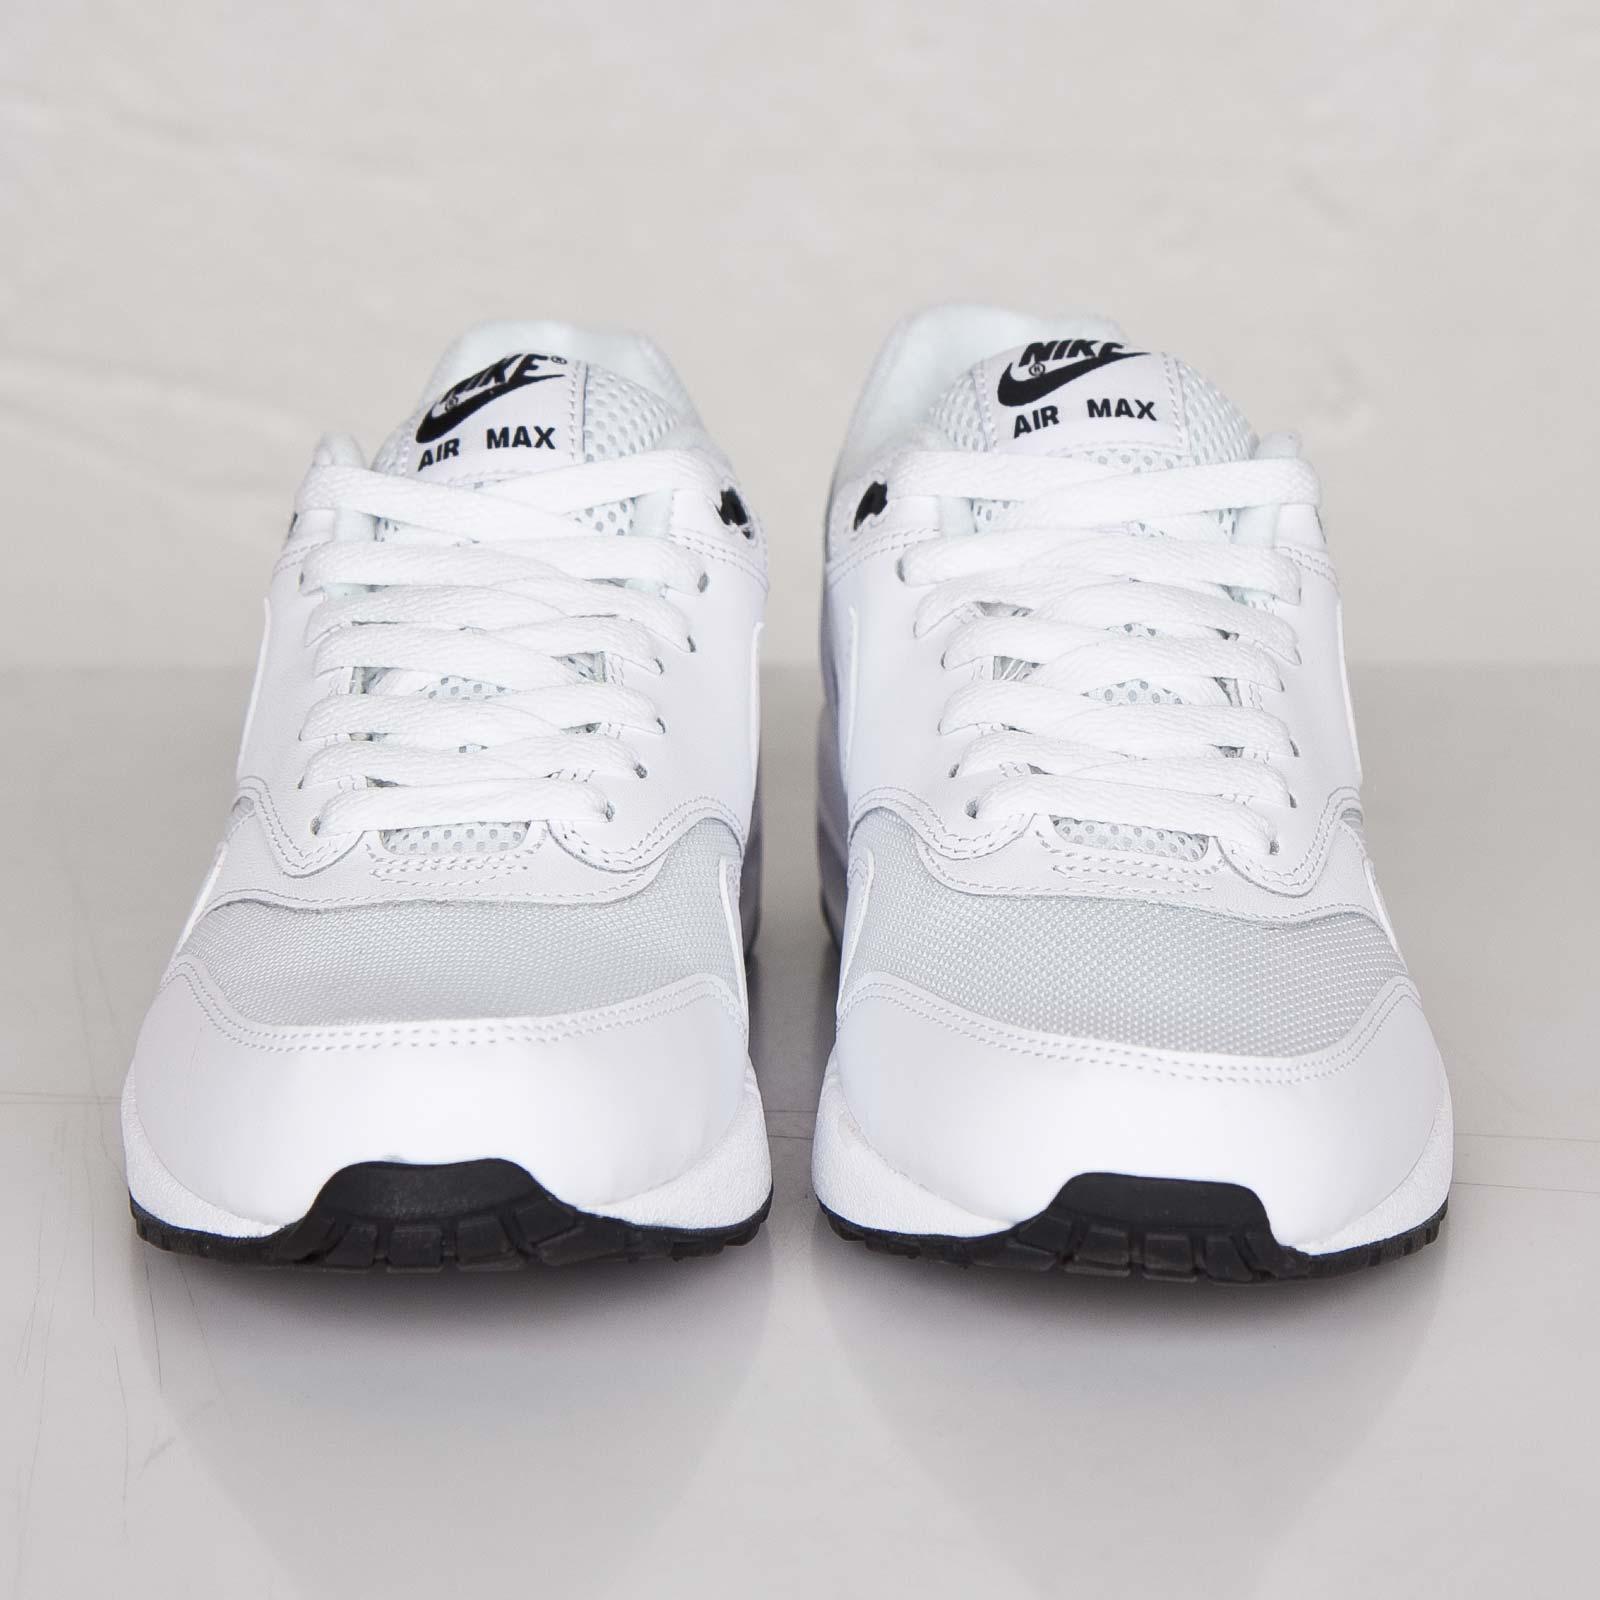 Nike Air Max 1 Chaussuressnstuff Essential 537383 125 Chaussuressnstuff 1 ChaussuresEt 58b710